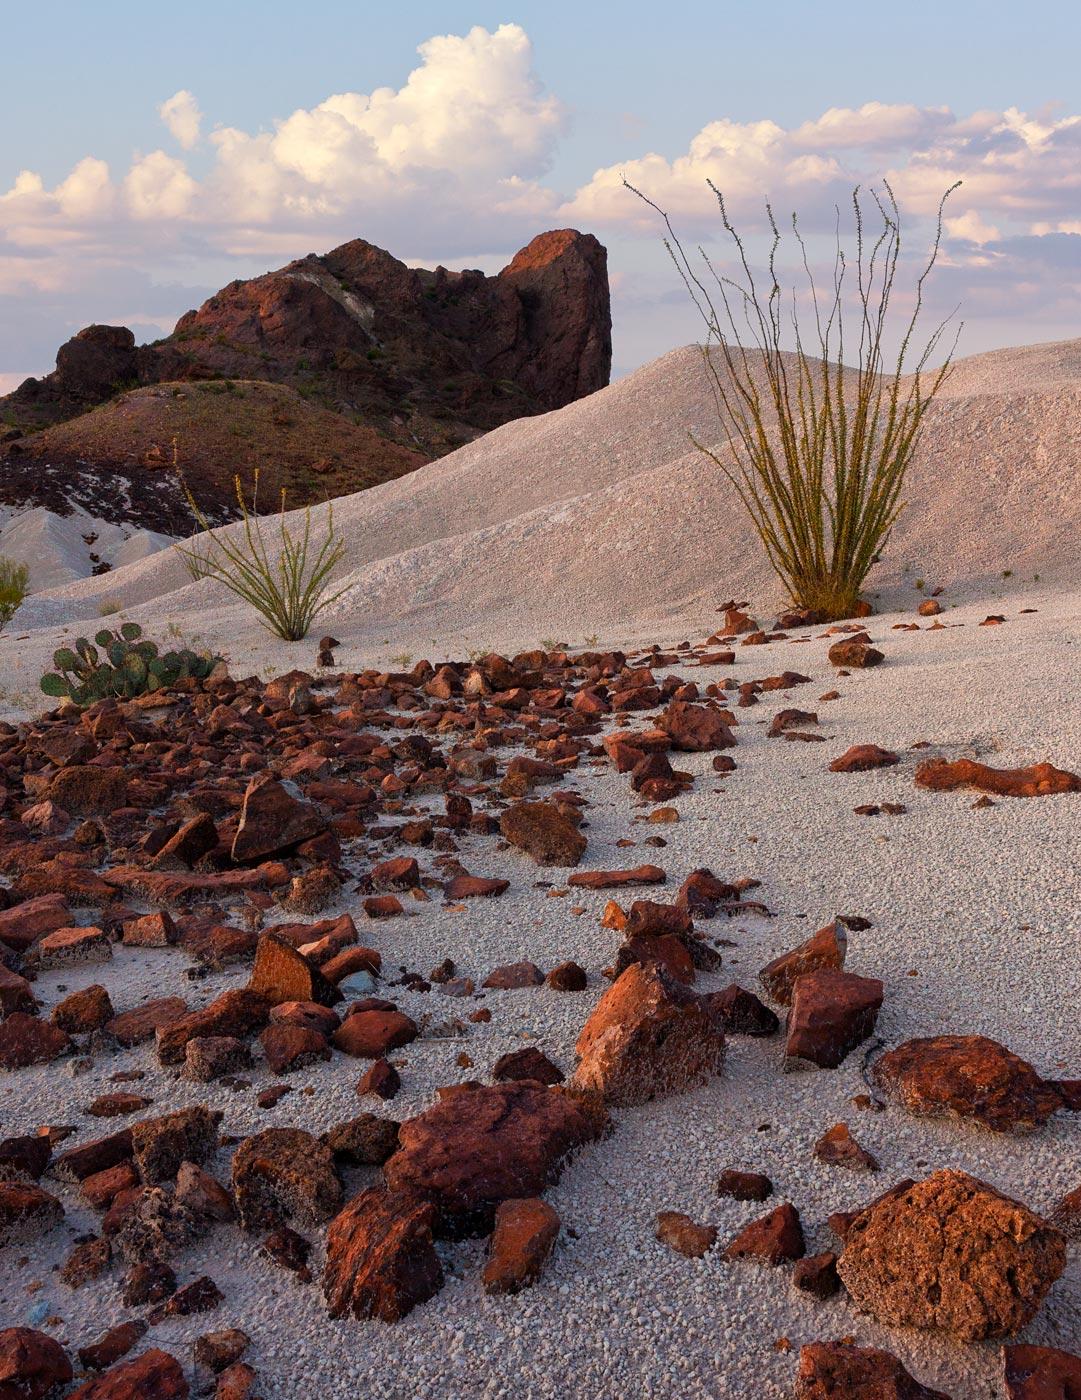 Big-Bend-National-Park-ABP-Cerro-Castellan_sunset.jpg